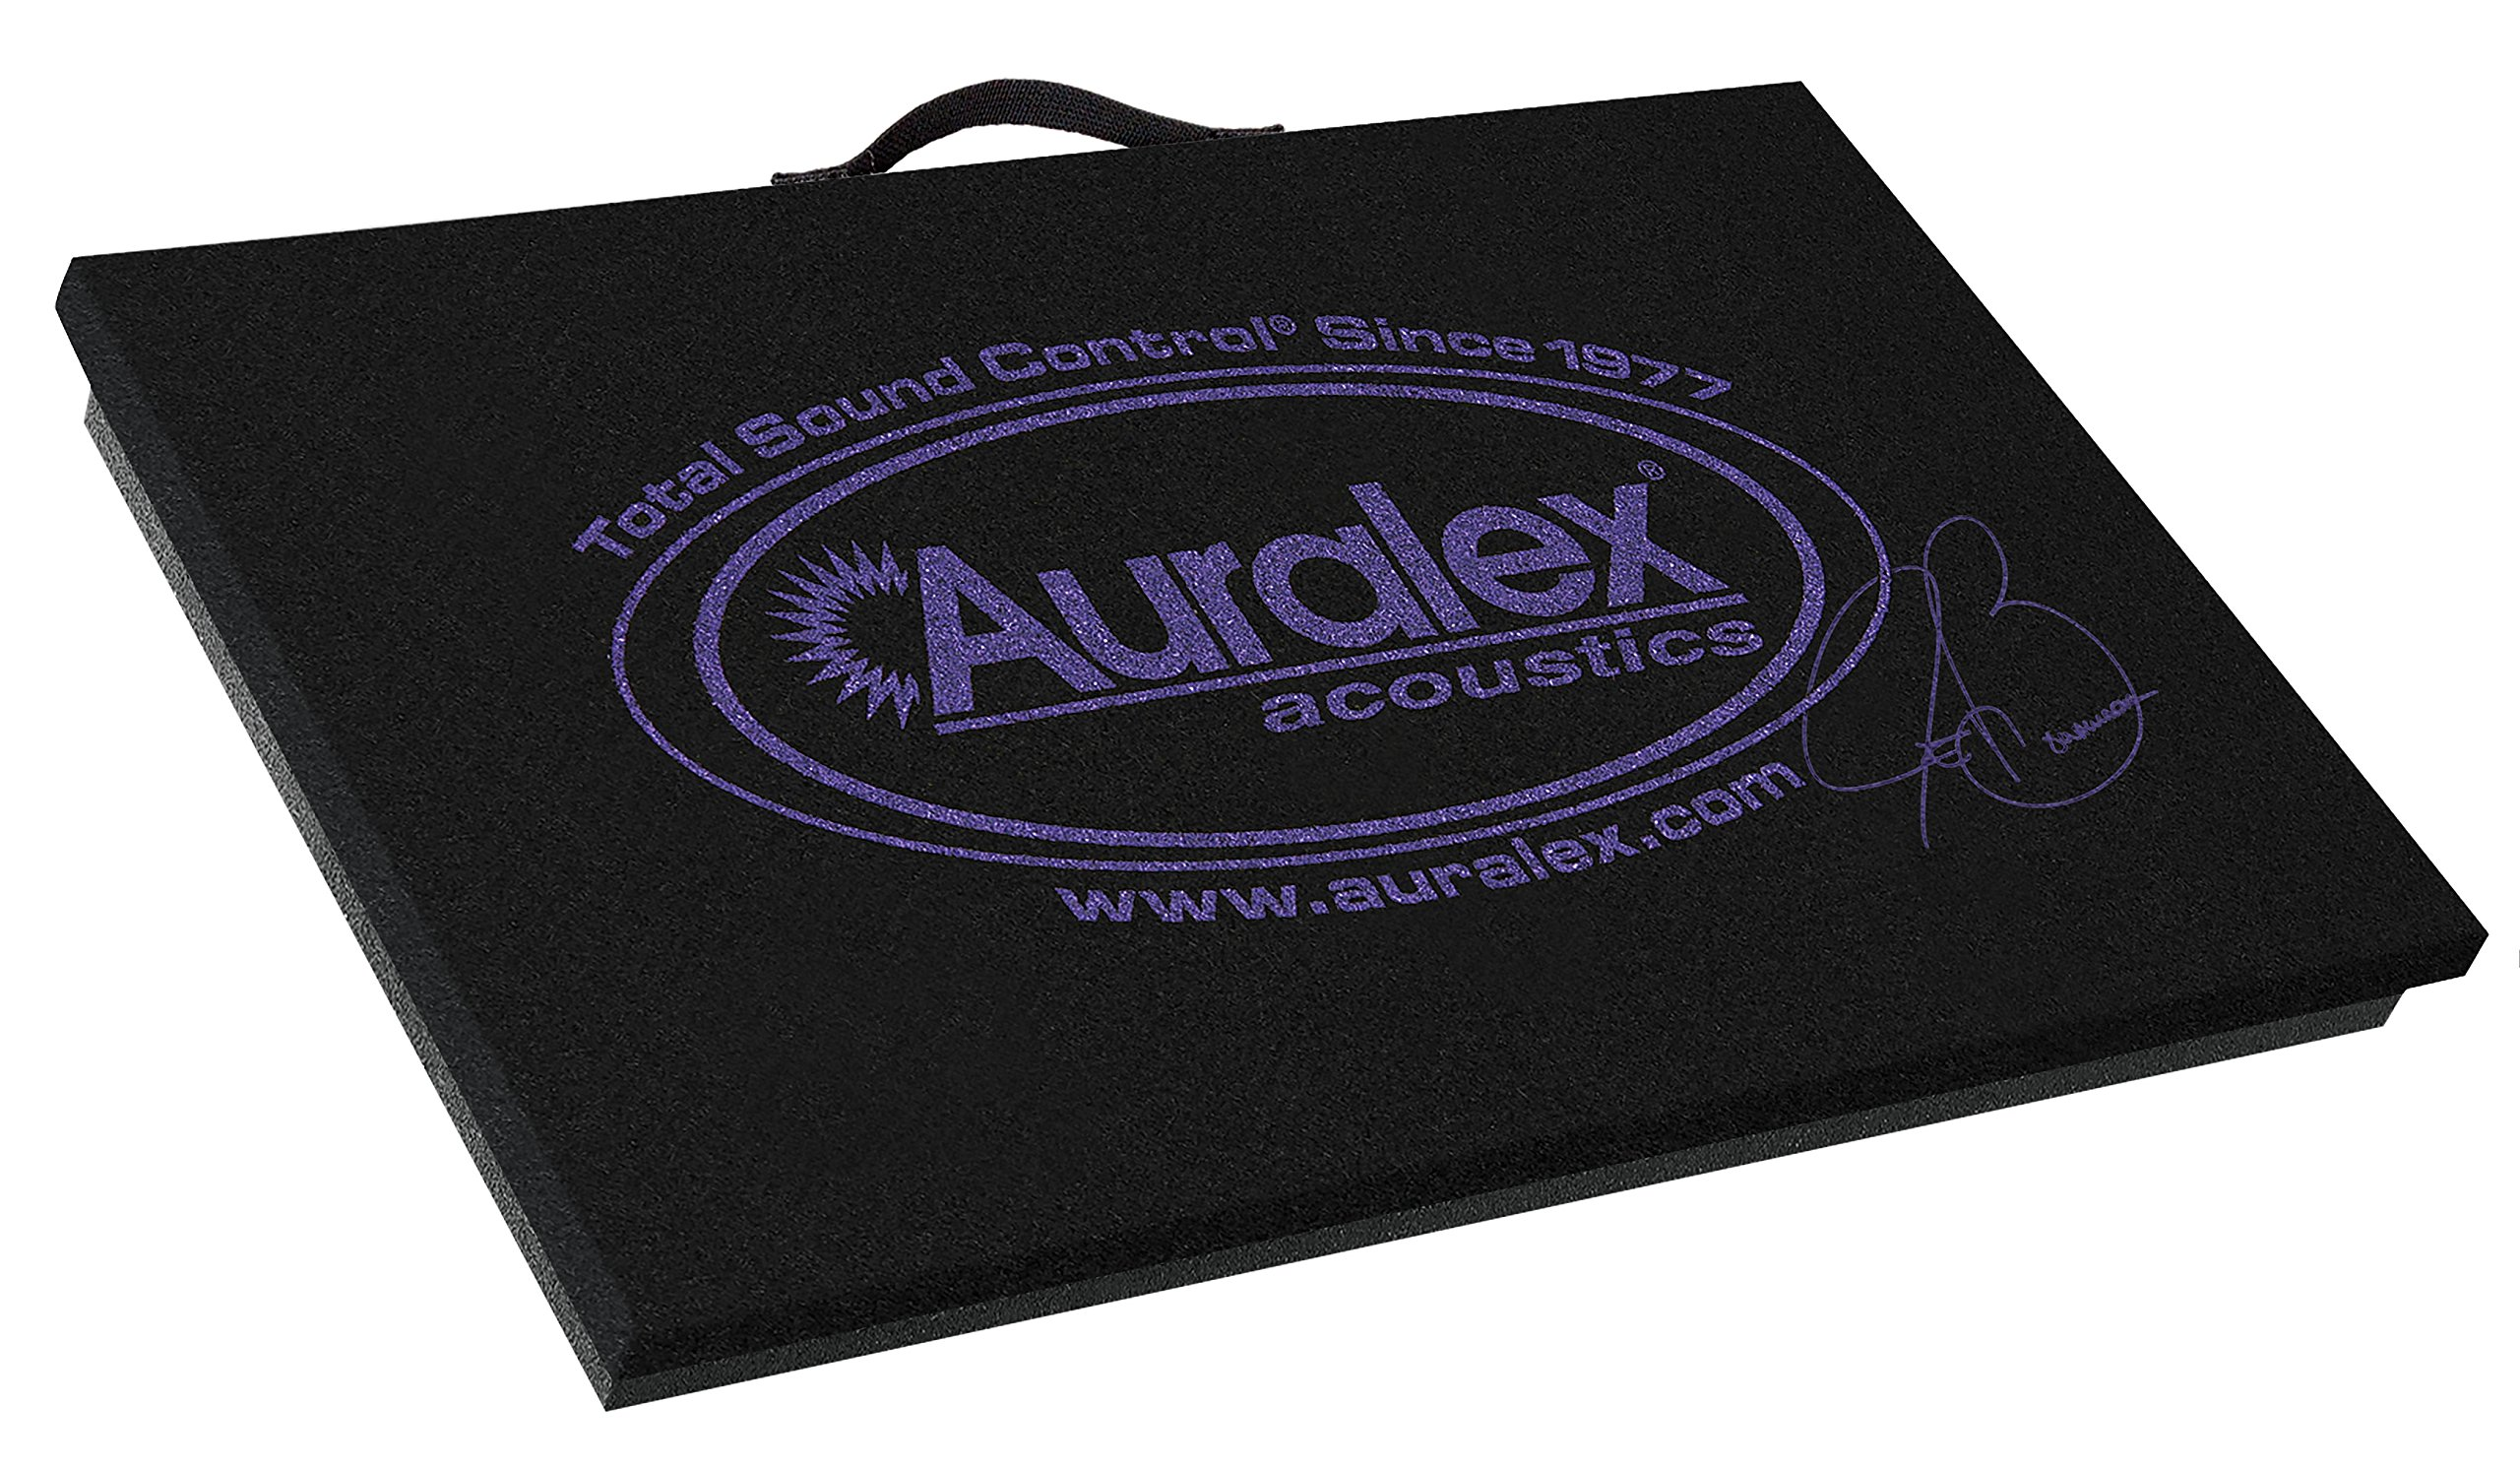 Auralex Acoustics GreatGRAMMA v2 Isolation Platform for Amplifiers, 1.75'' x 19'' x 30''